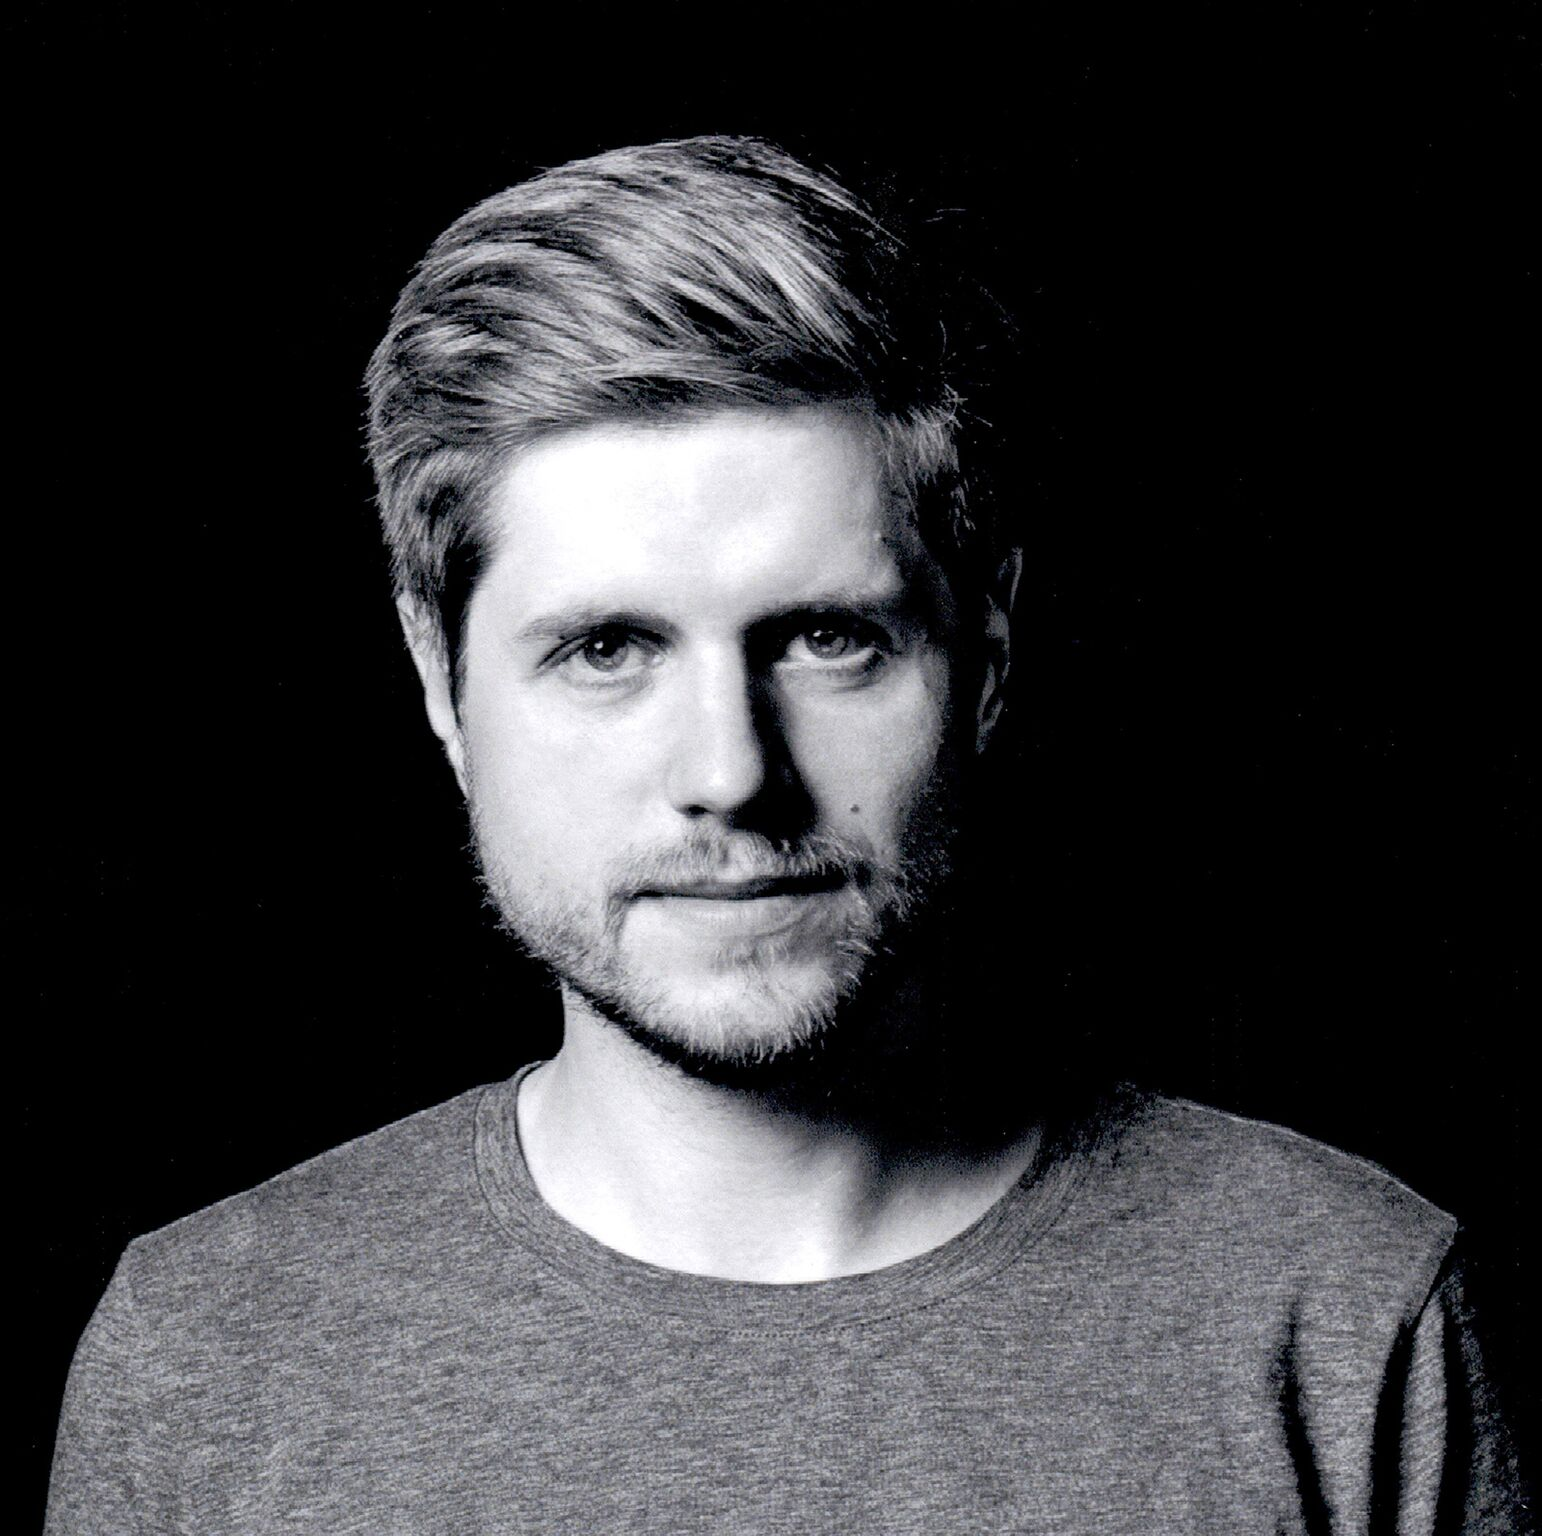 Speaker Максим Козлов